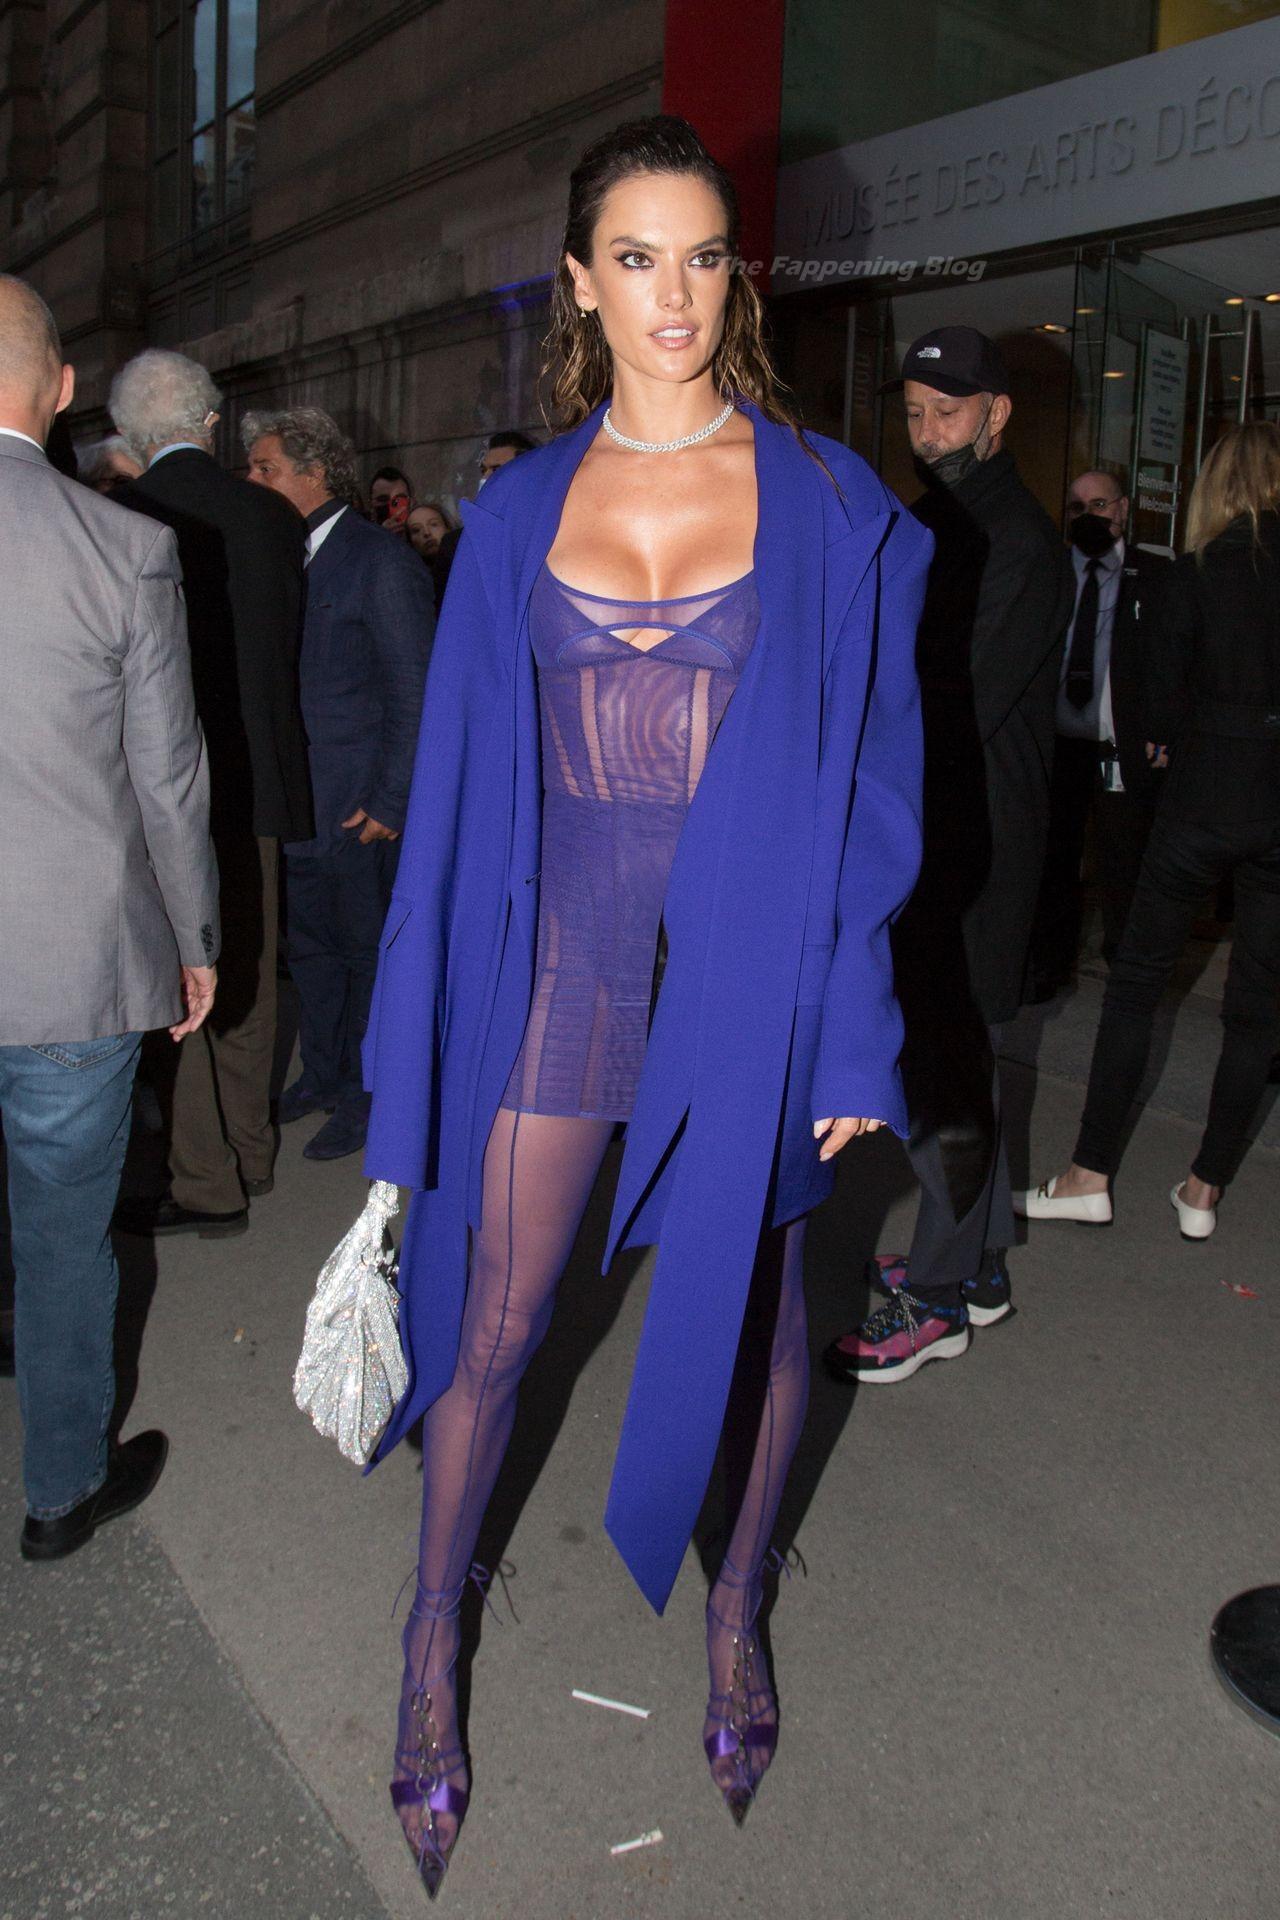 Alessandra-Ambrosio-Sexy-The-Fappening-Blog-8-3.jpg